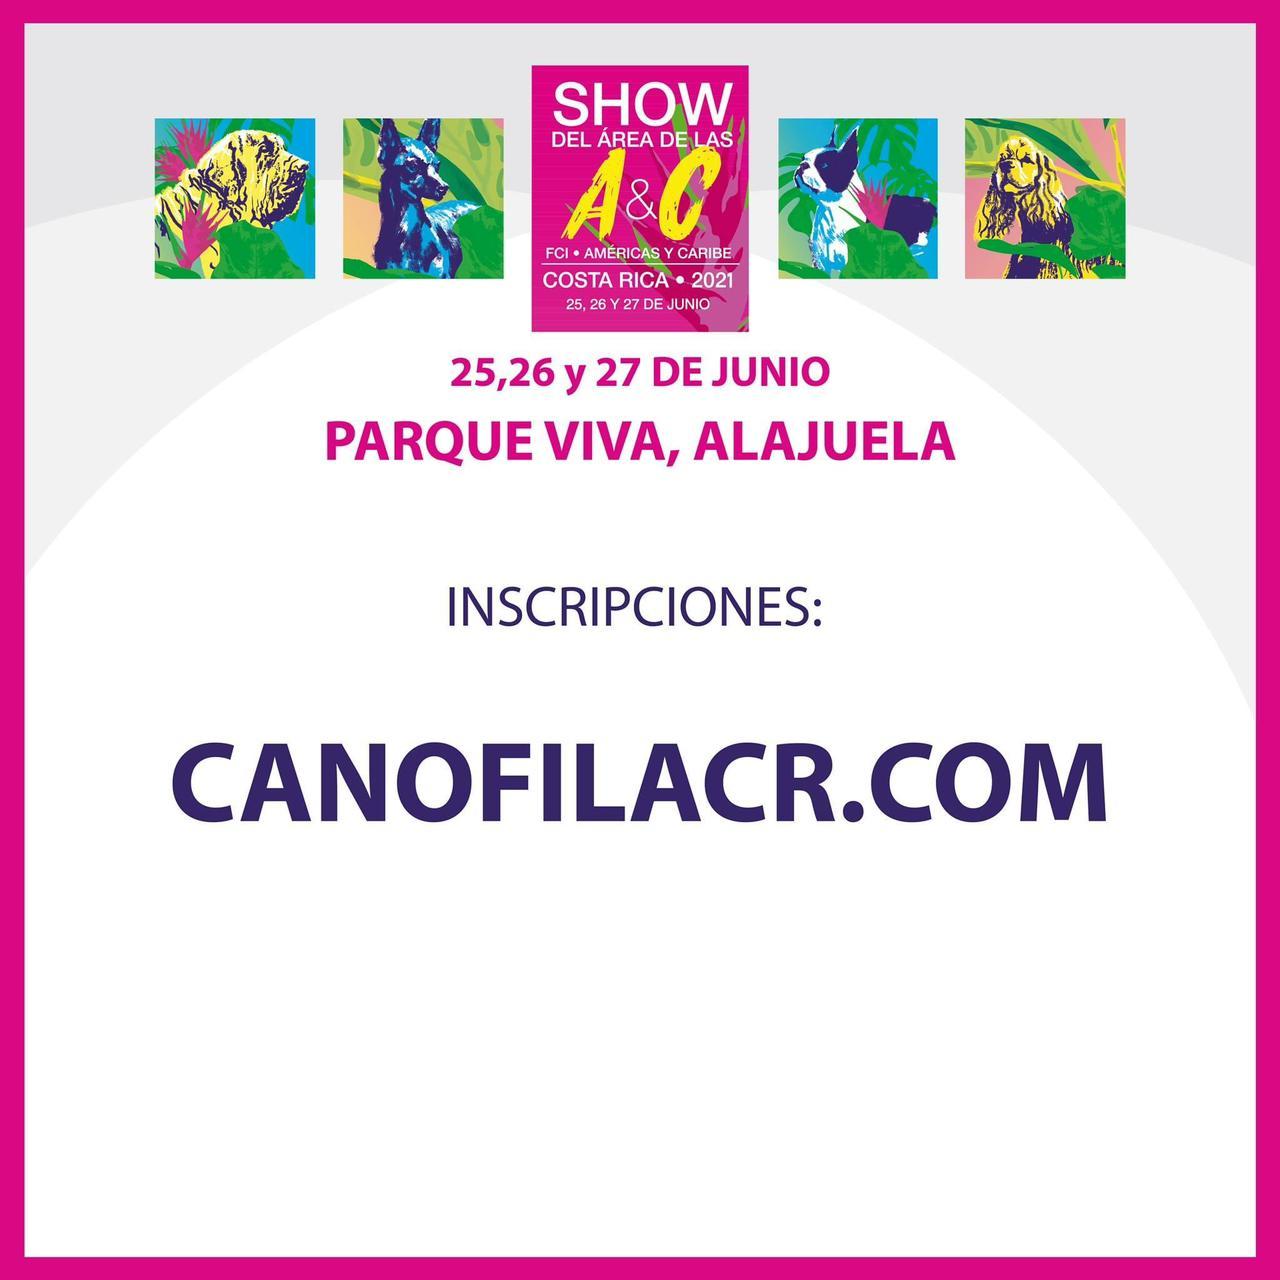 americas-caribe (7)